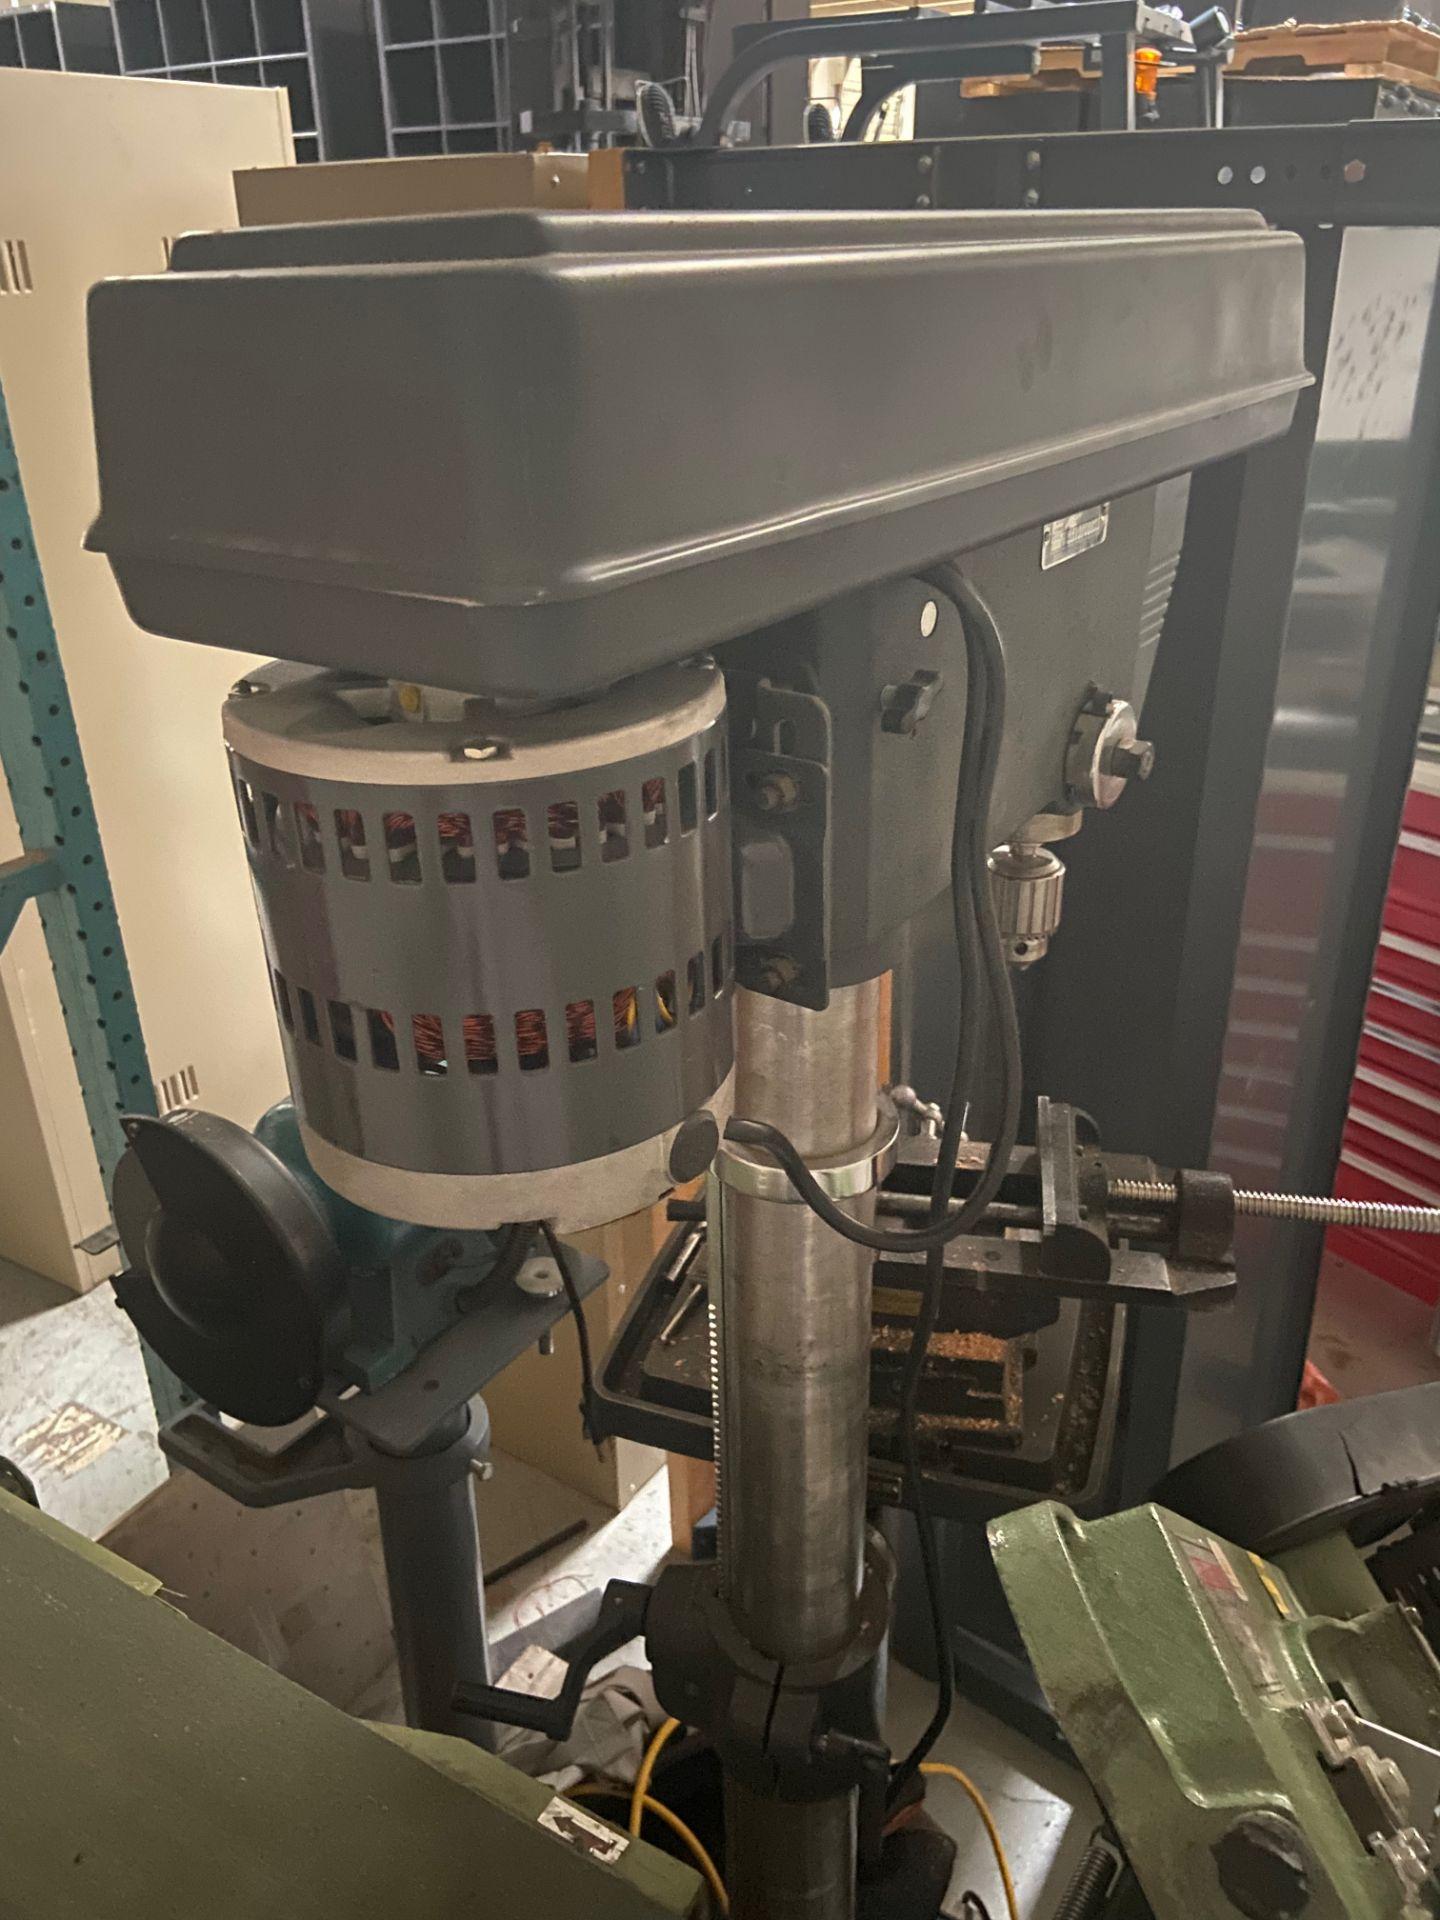 "Sears/Craftsman 17"" Drill Press, 5/8"" Chuck, 200-3630 RPM, Model# 113.213171, Serial# 961870038, - Image 5 of 6"